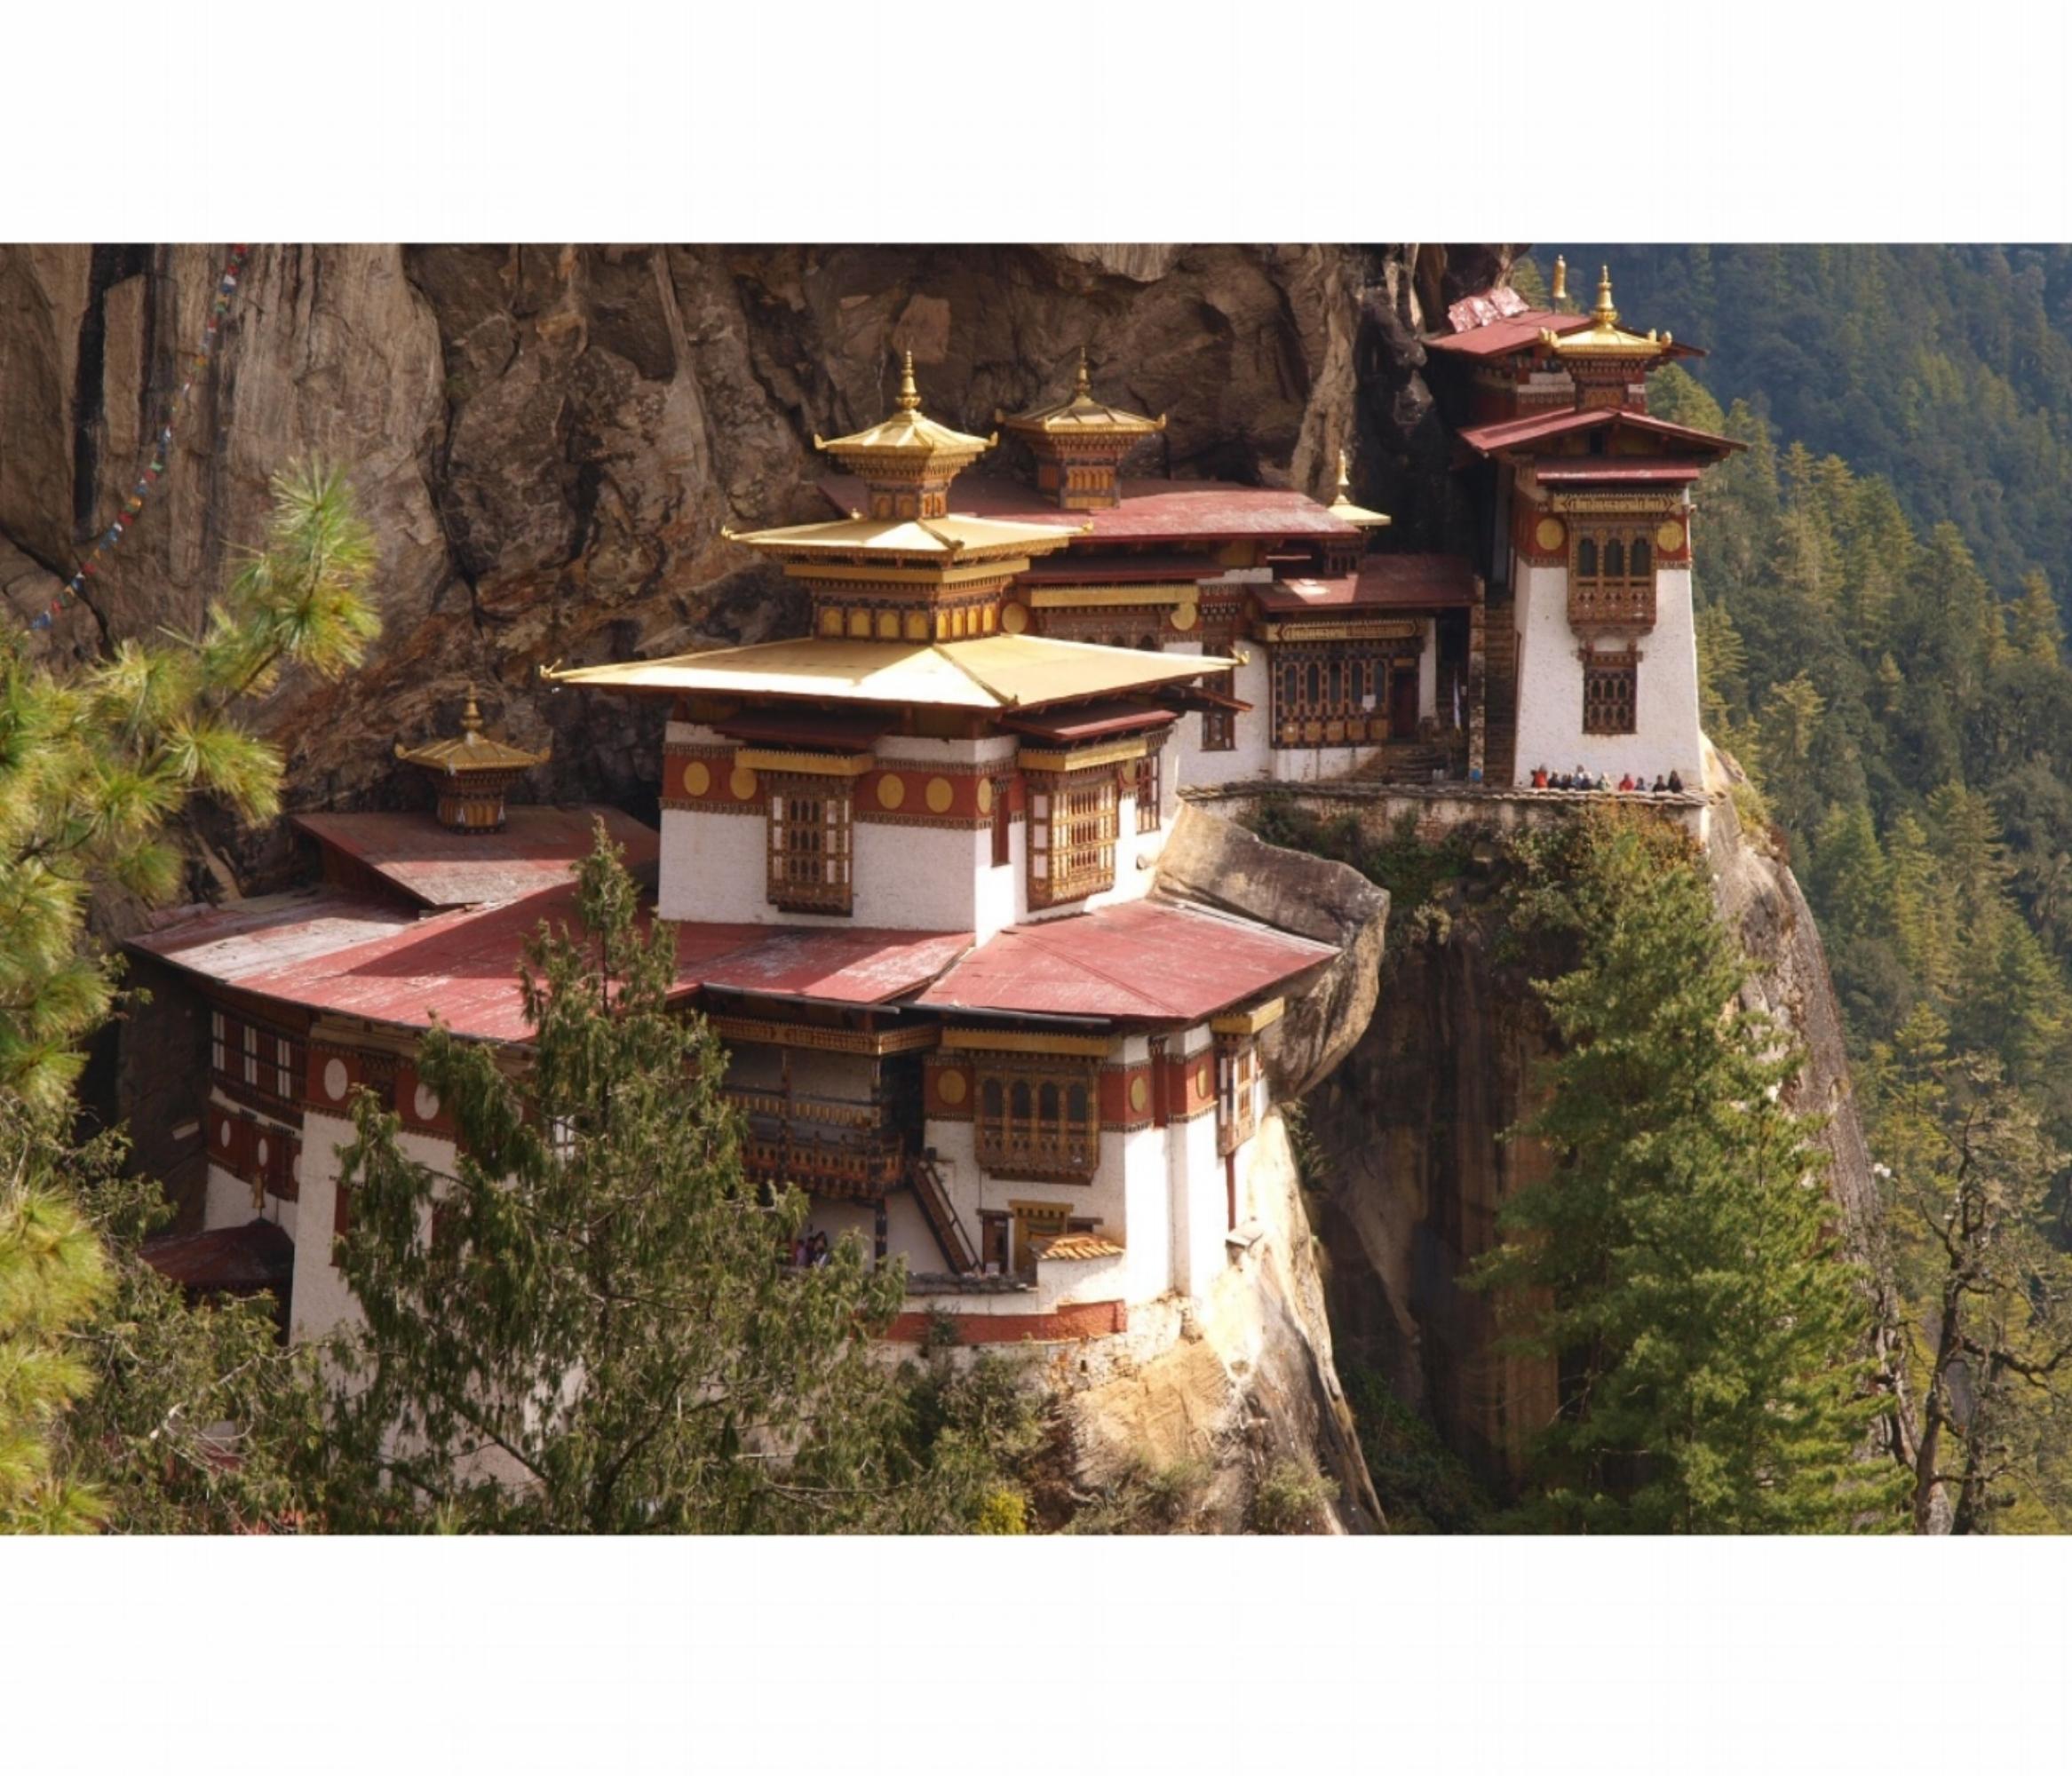 Taktsang Palphug Monastery (Tiger's Nest) Paro Valley, Bhutan